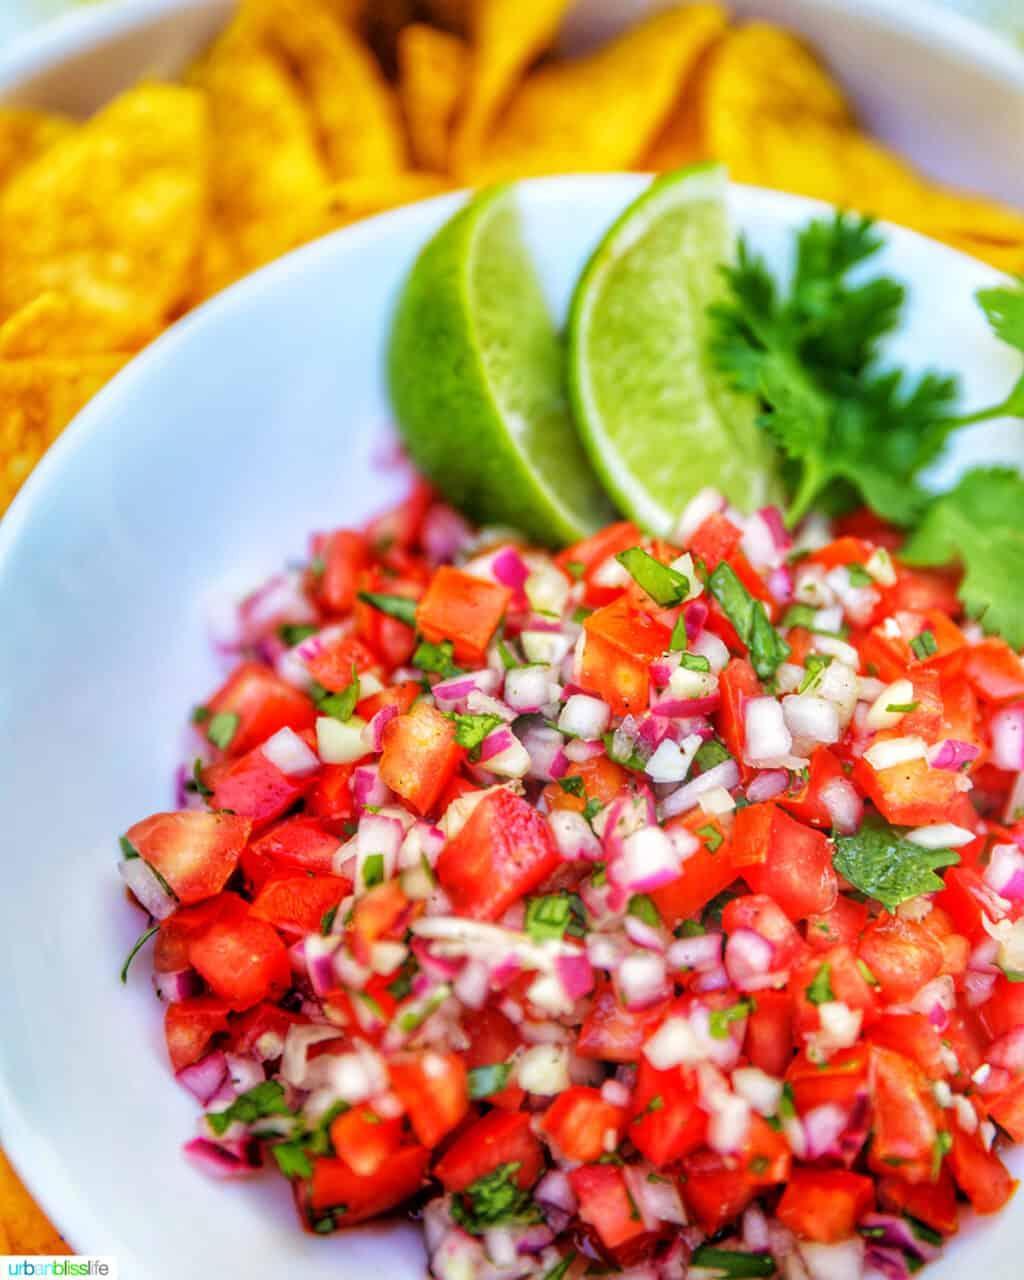 bowl of pico de gallo with tortilla chips